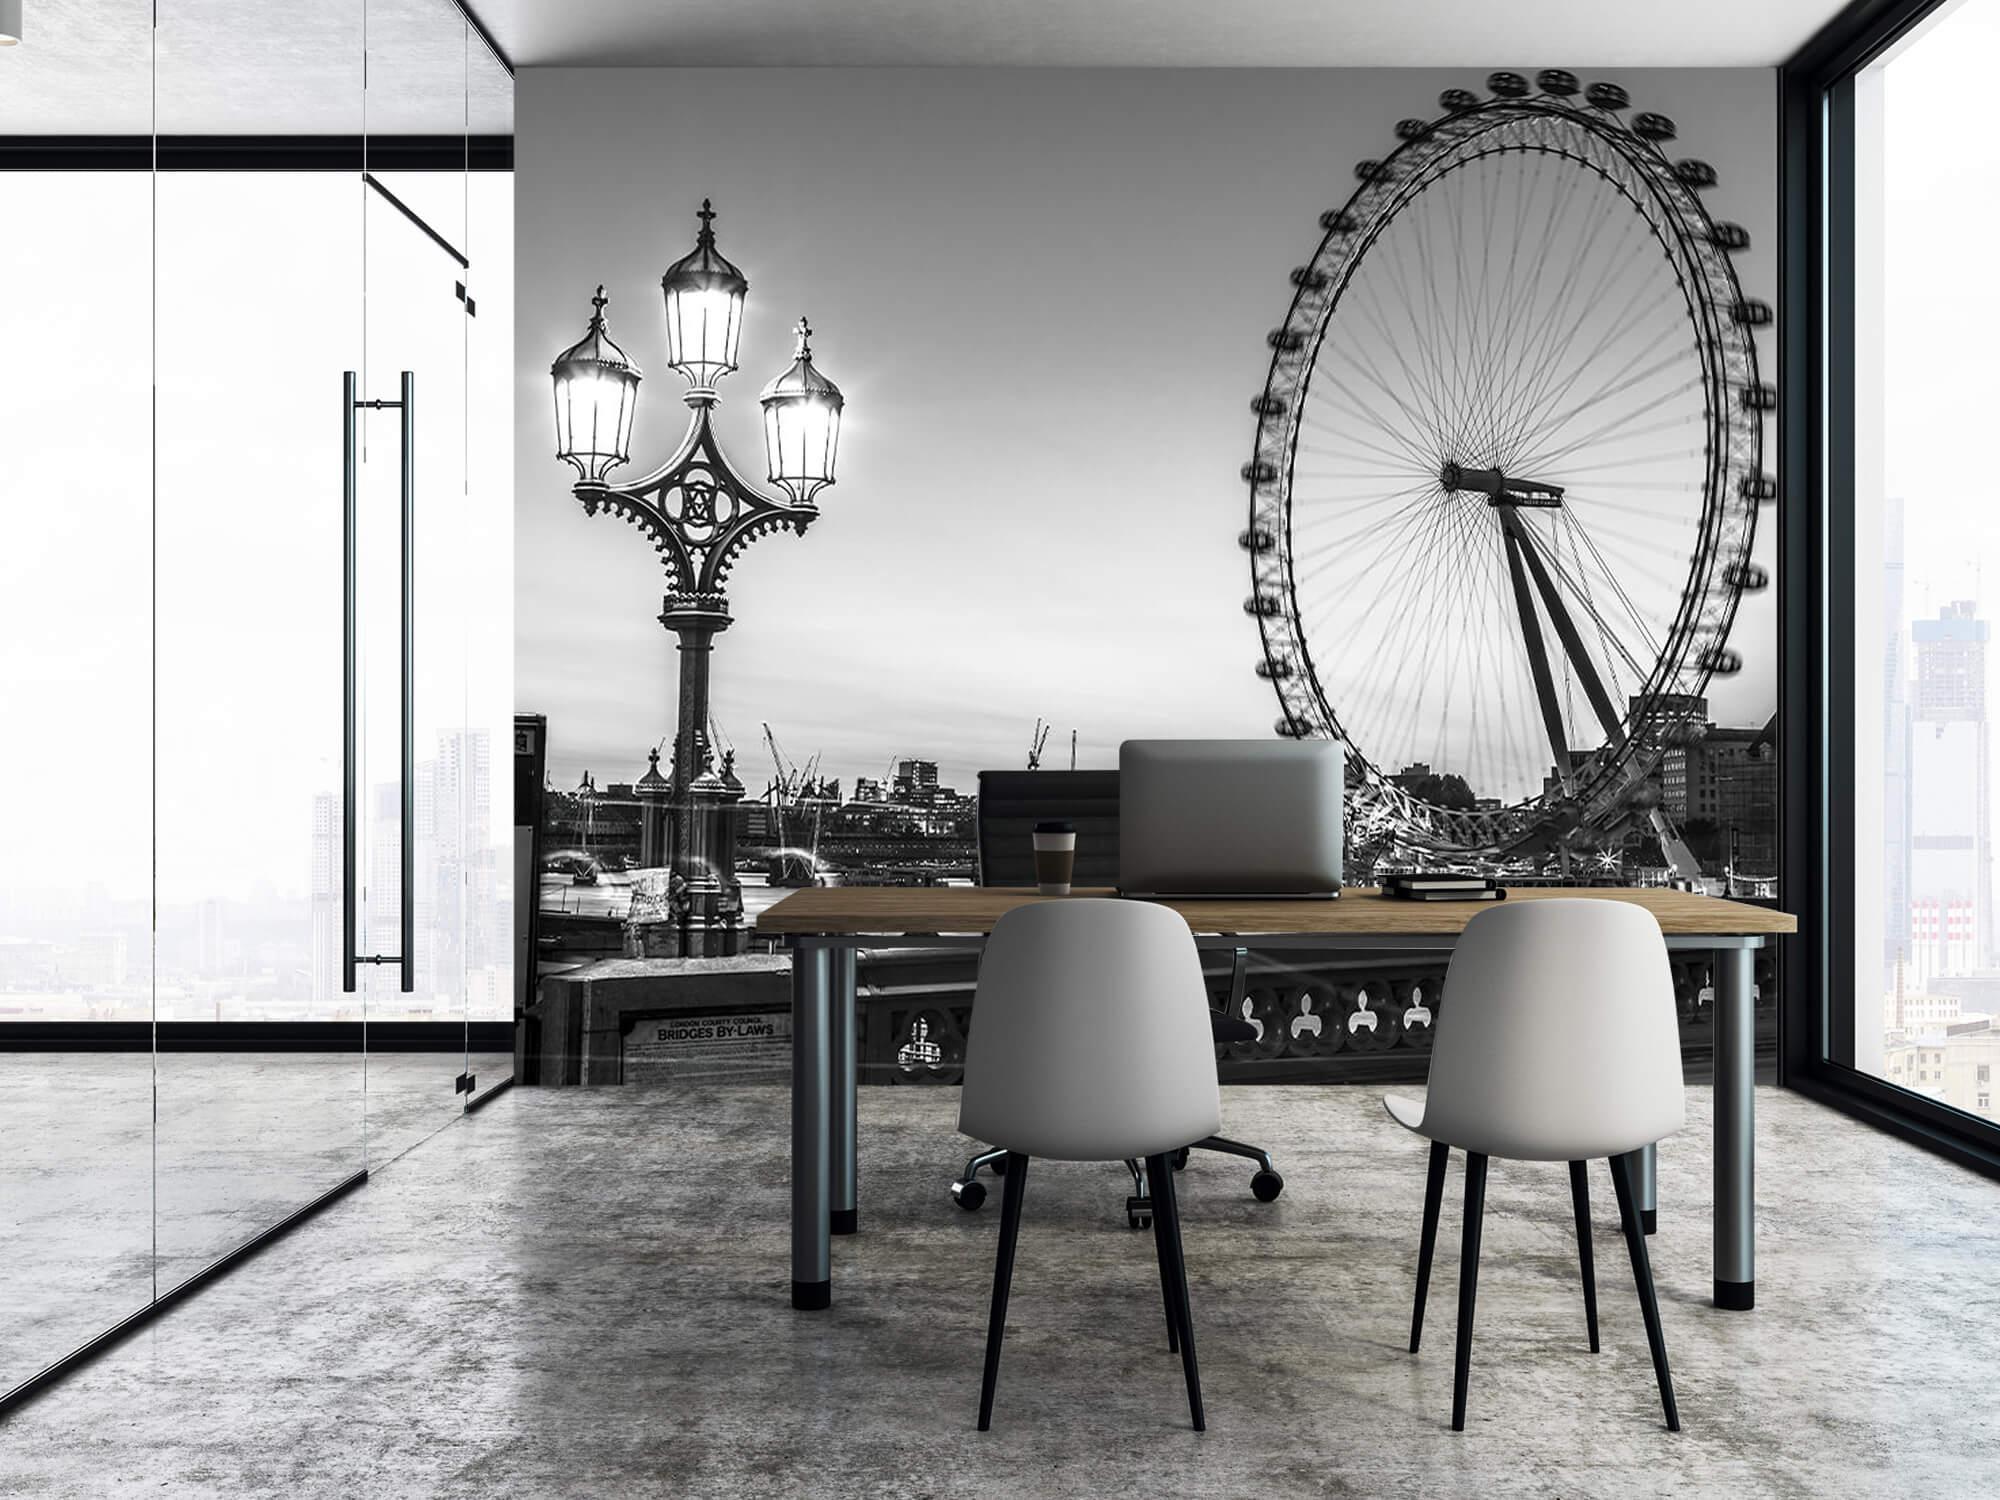 Ferris wheel black and white 9